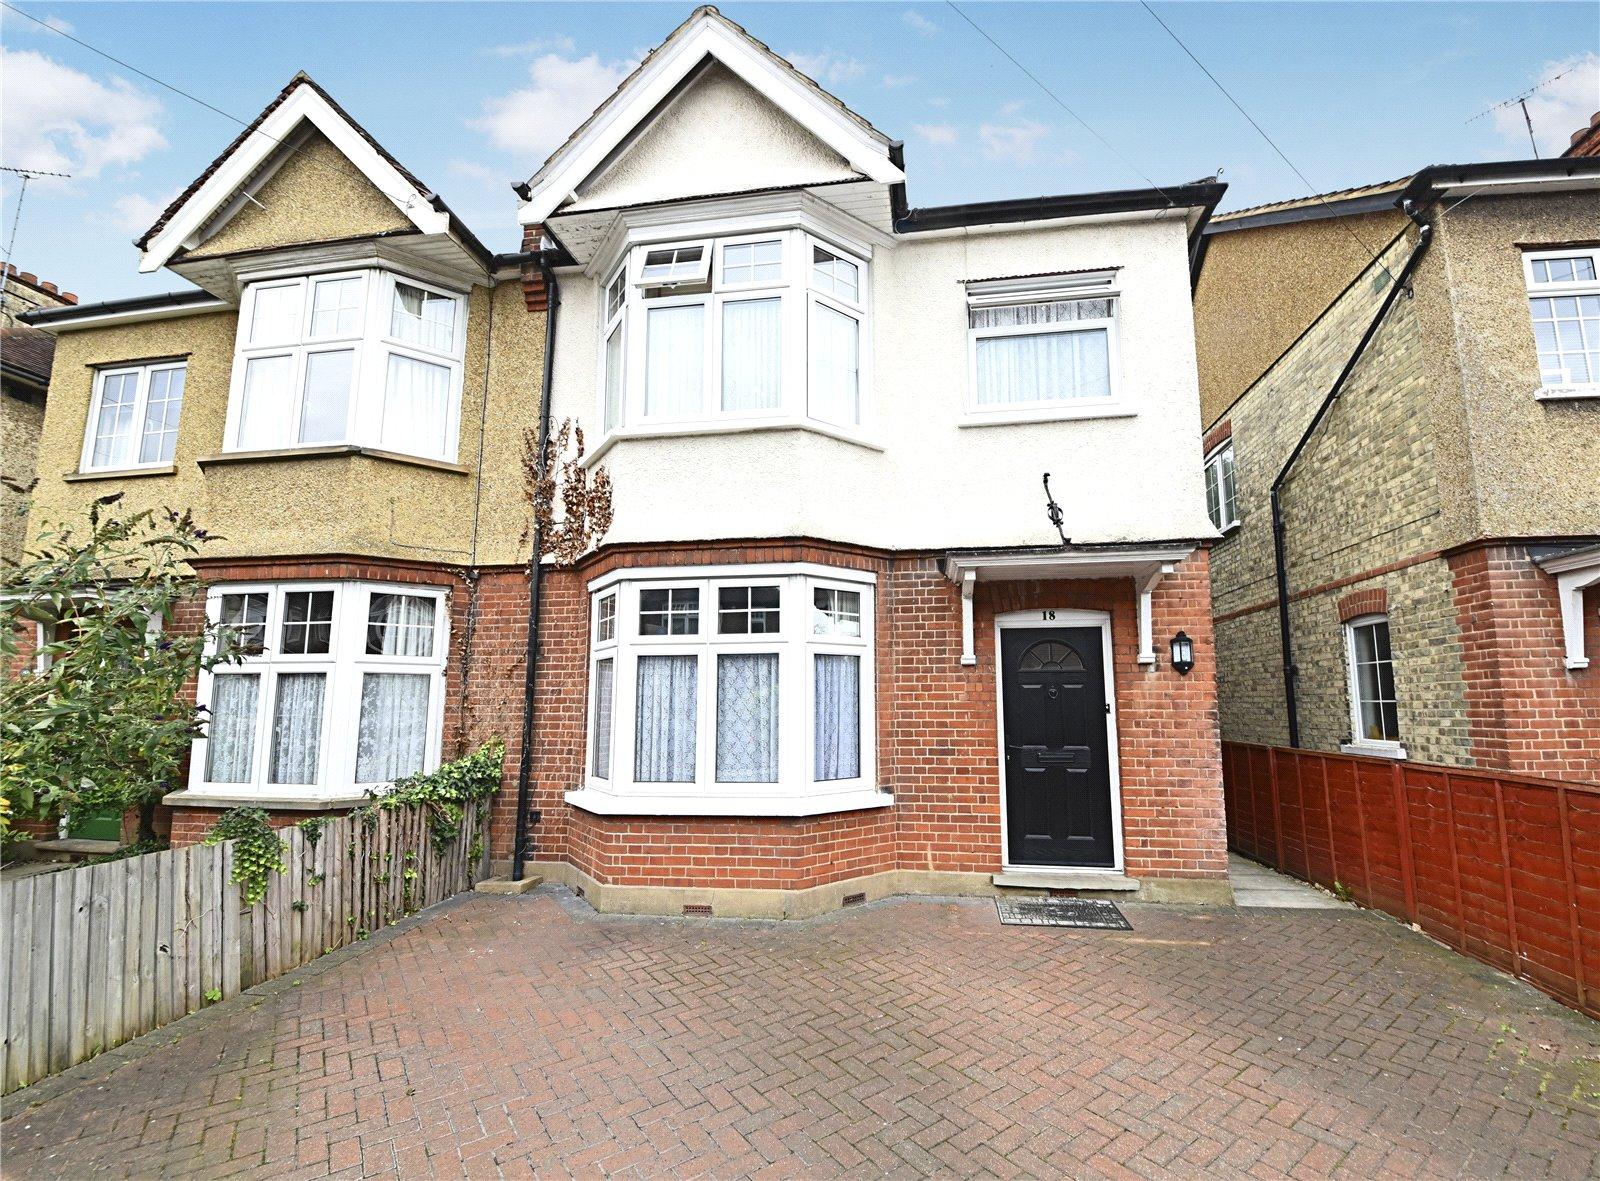 4 bed house for sale in New Barnet, EN5 5HT - Property Image 1